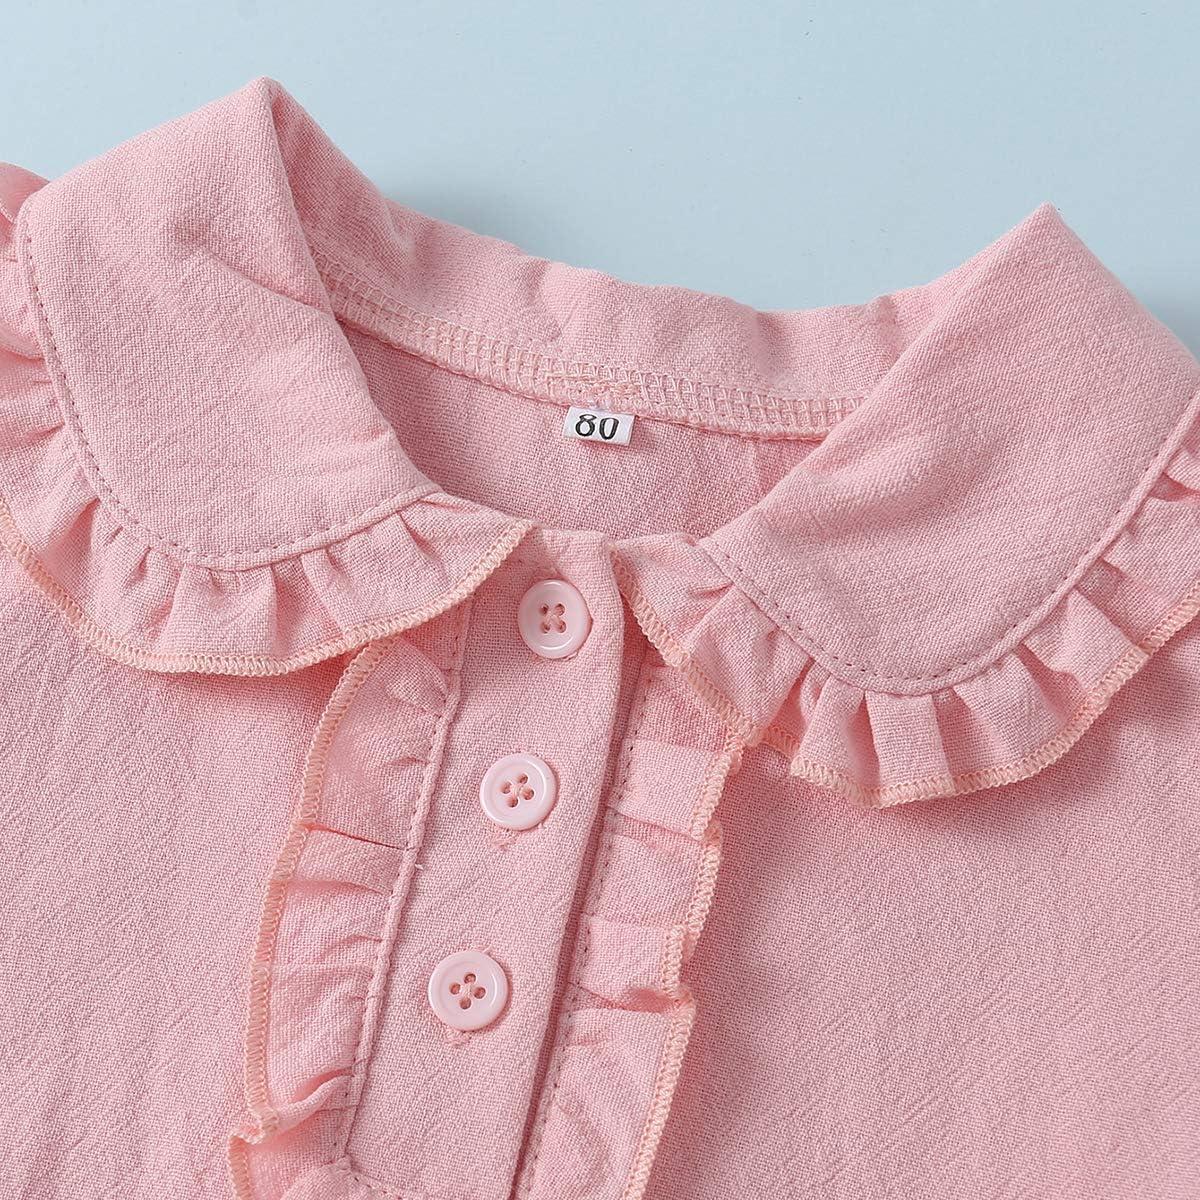 KUKEONON Infant Girls Long Sleeve Cotton Shirt with Cute flouncey Sleeve and Collar Design